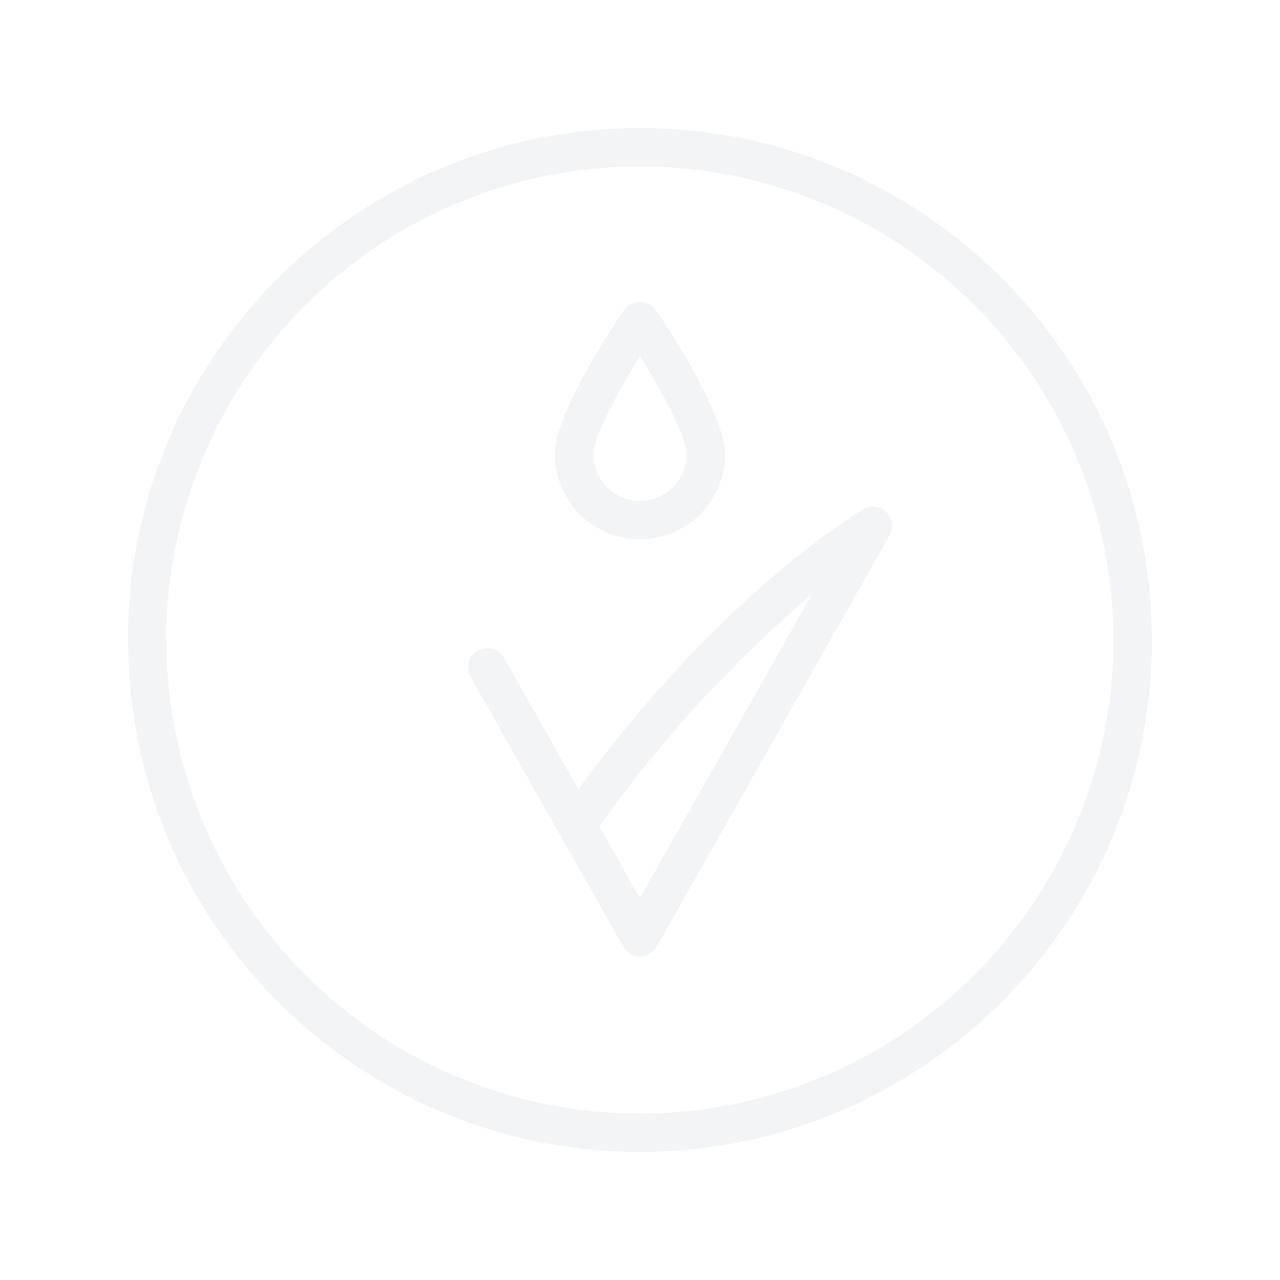 COLLISTAR Men Perfect Adherence Shaving Foam for Sensitive Skins 3x75ml пена для бритья